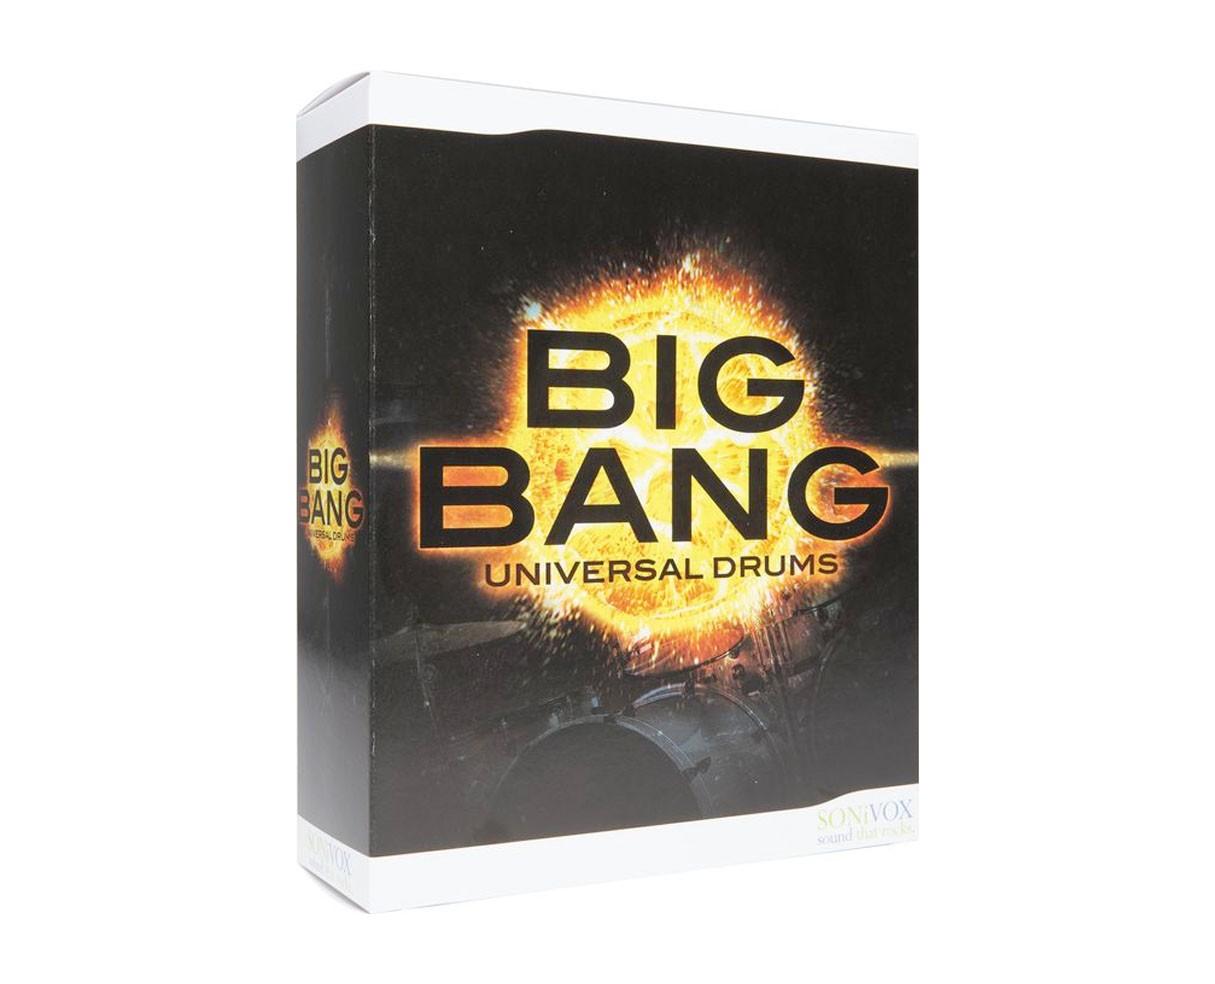 SONiVOX Big Bang - Universal Drums